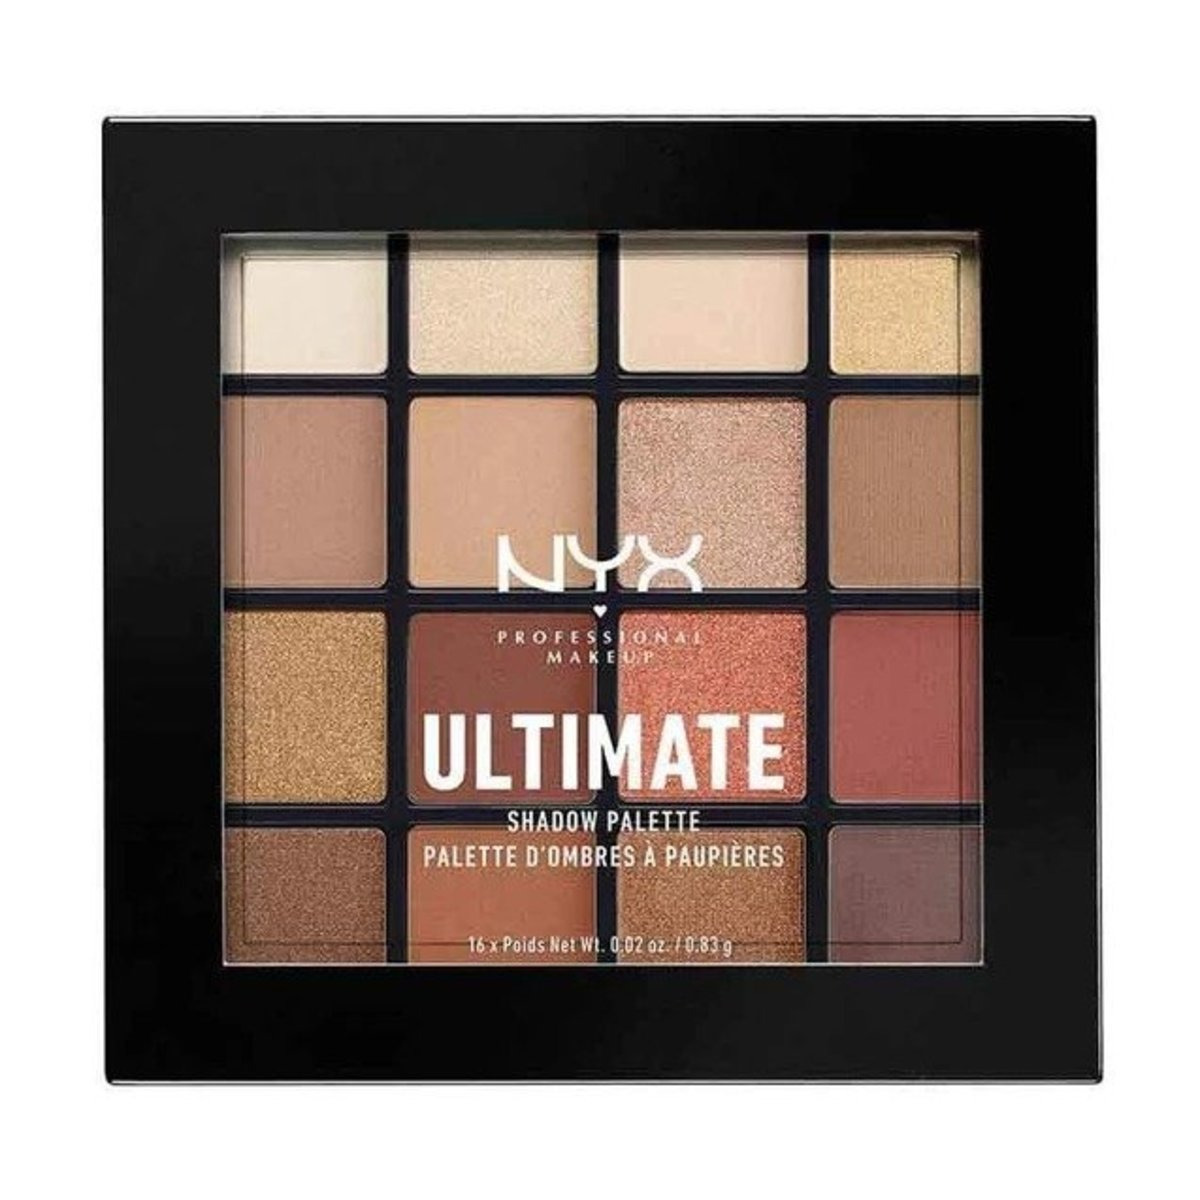 Ultimate 16-color eye shadow - 03 - Warm Neutrals